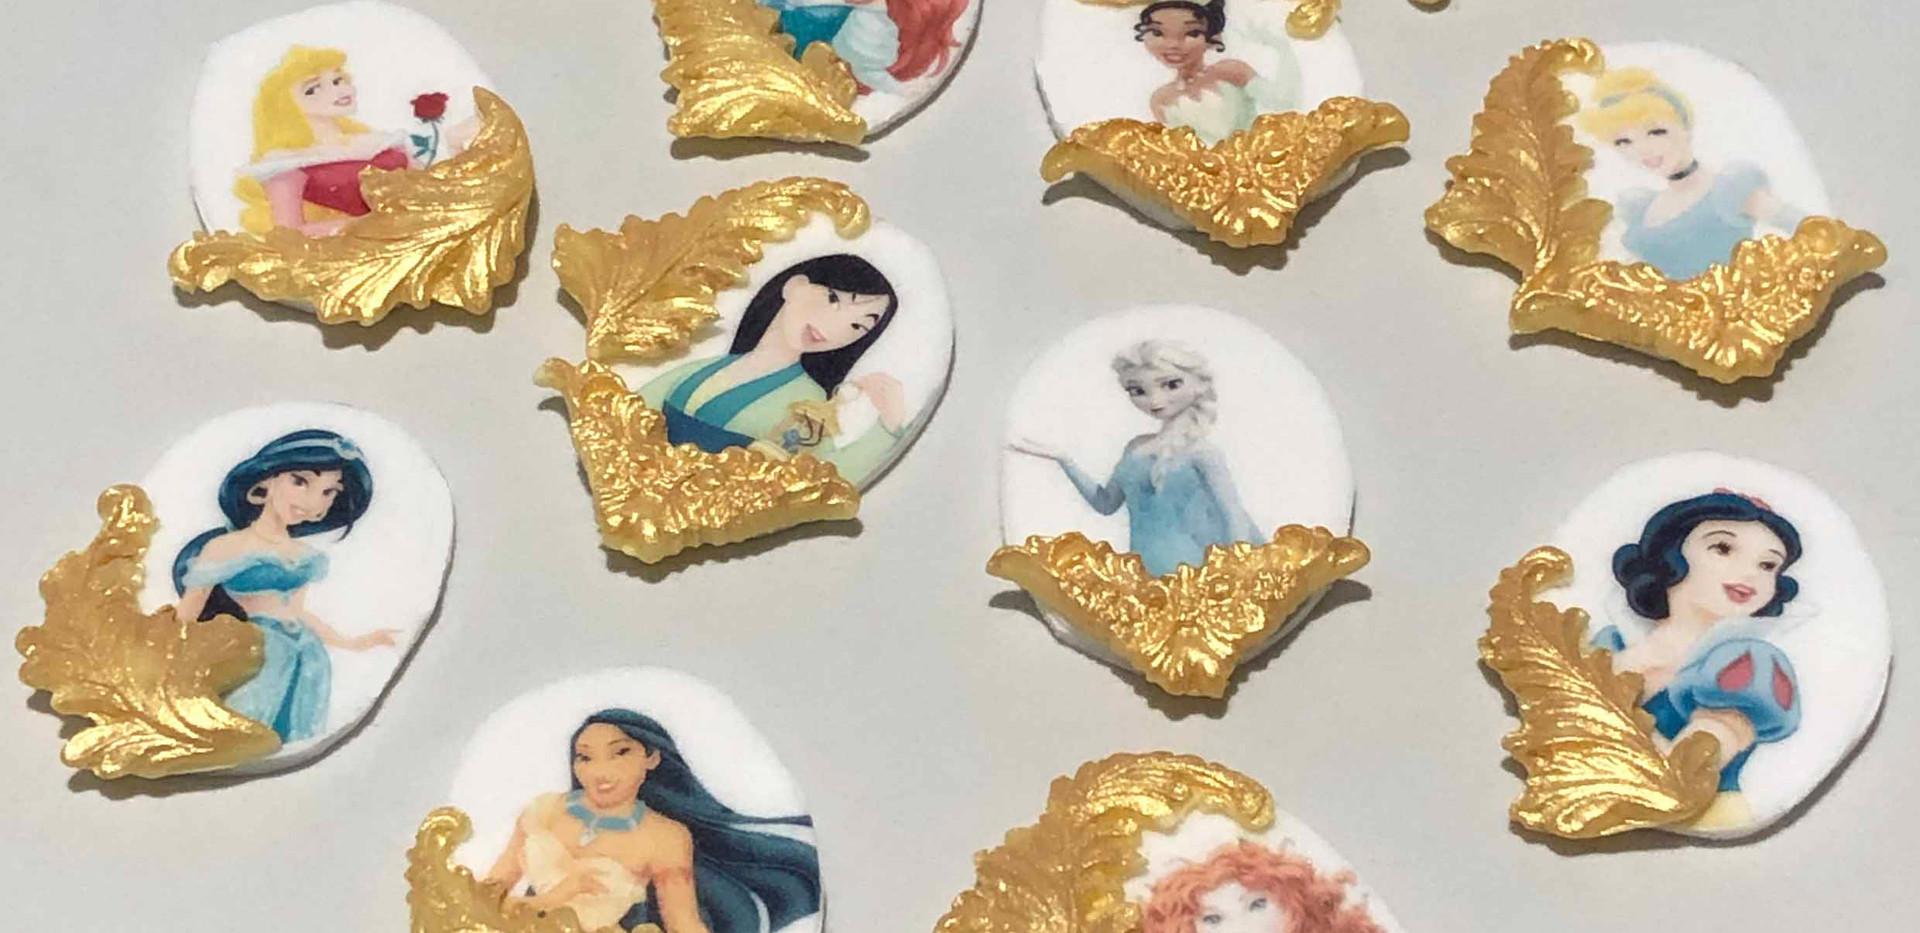 Disney Princess Pop Image 12 with LOGO L